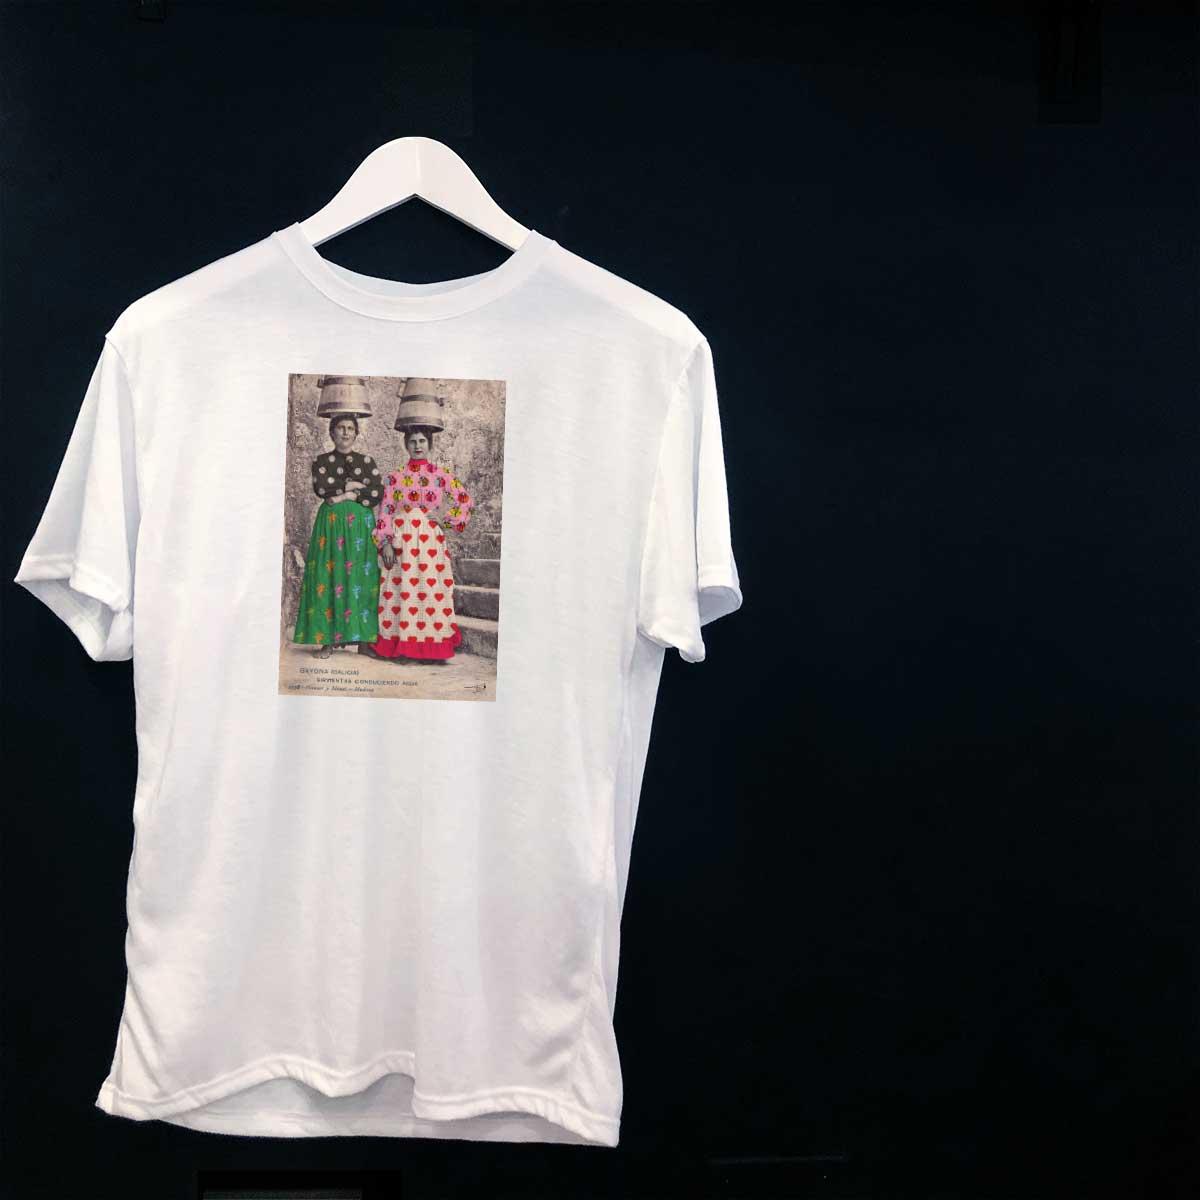 SerIgrafia Baiona camiseta online camista personalizada mariñeiros Baiona souvenirs creativos singulares orignales exclusivos Bayprints Baiona